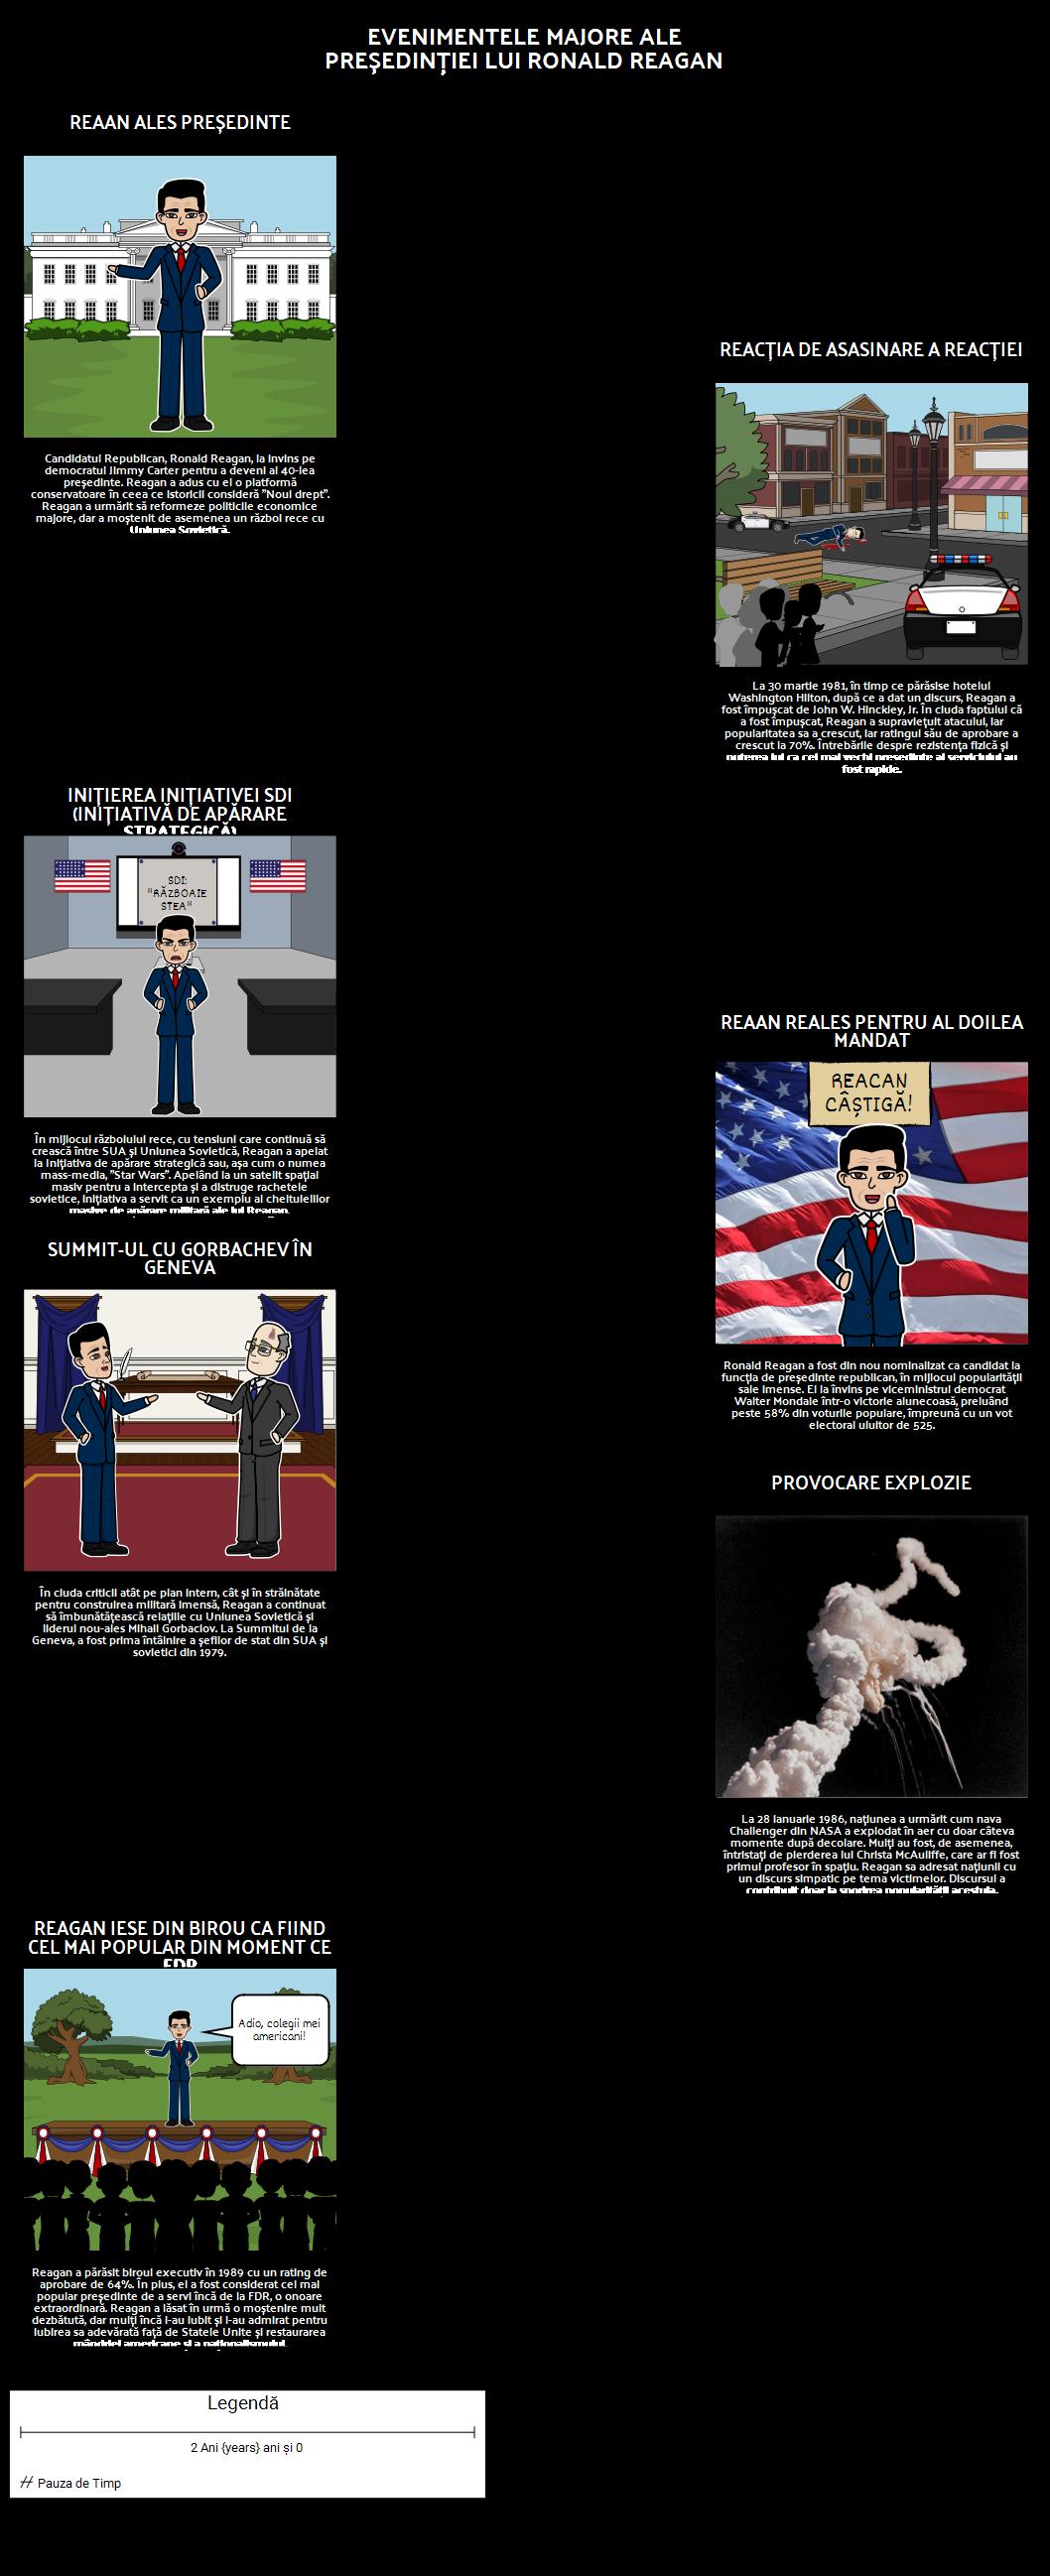 Reagan Președinția Cronologie